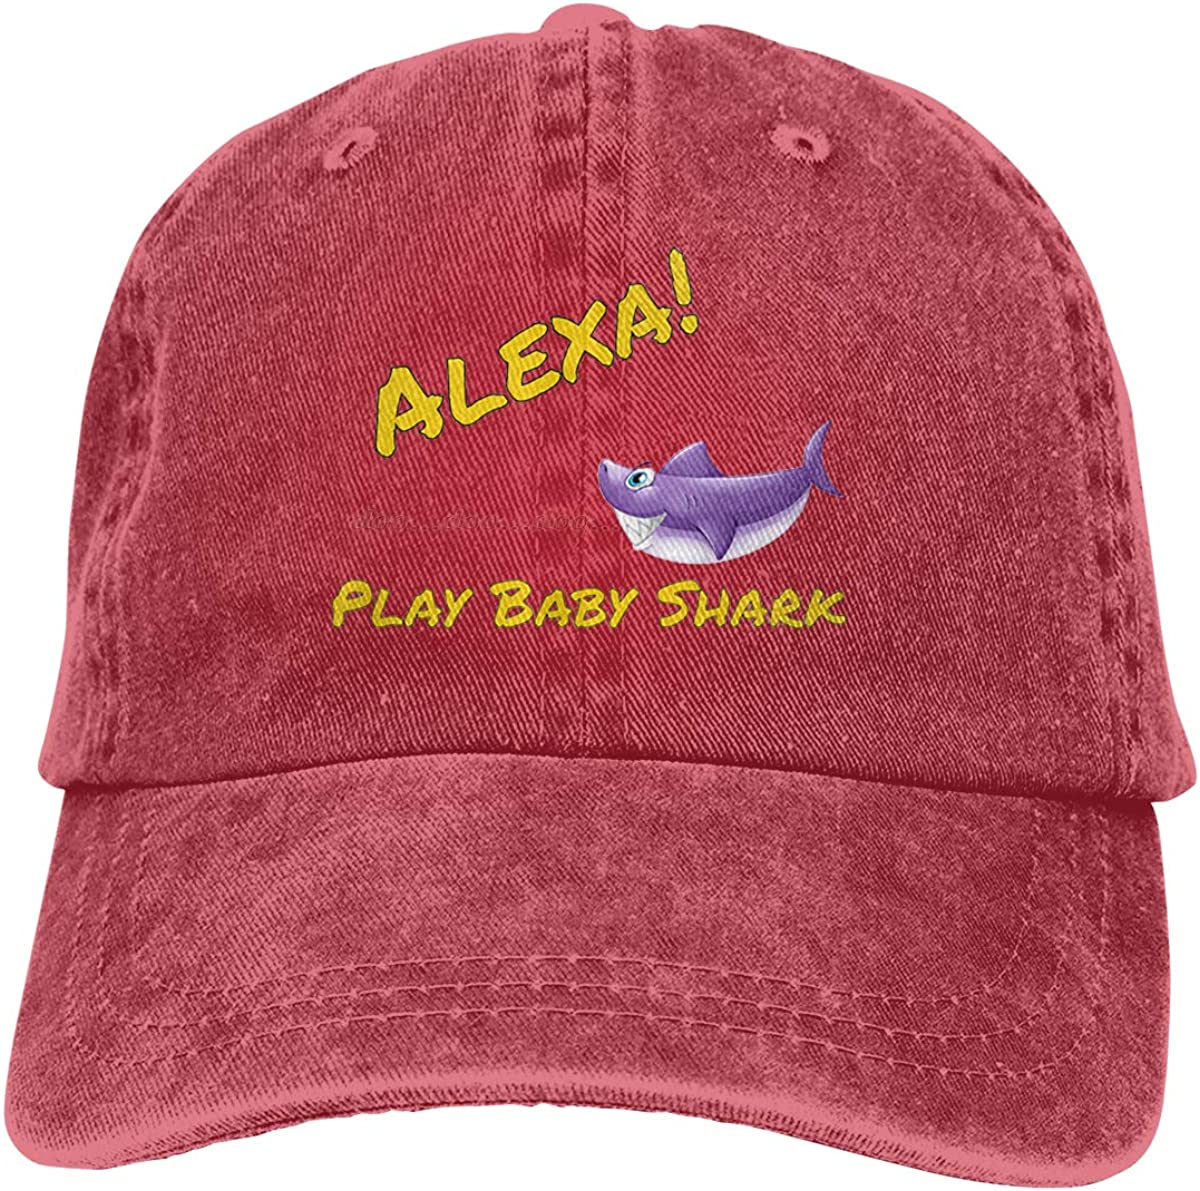 Men's Vintage Adjustable Dad-Hat Custom Alexa Play Baby Shark Cool Baseball Cap Hat, Red